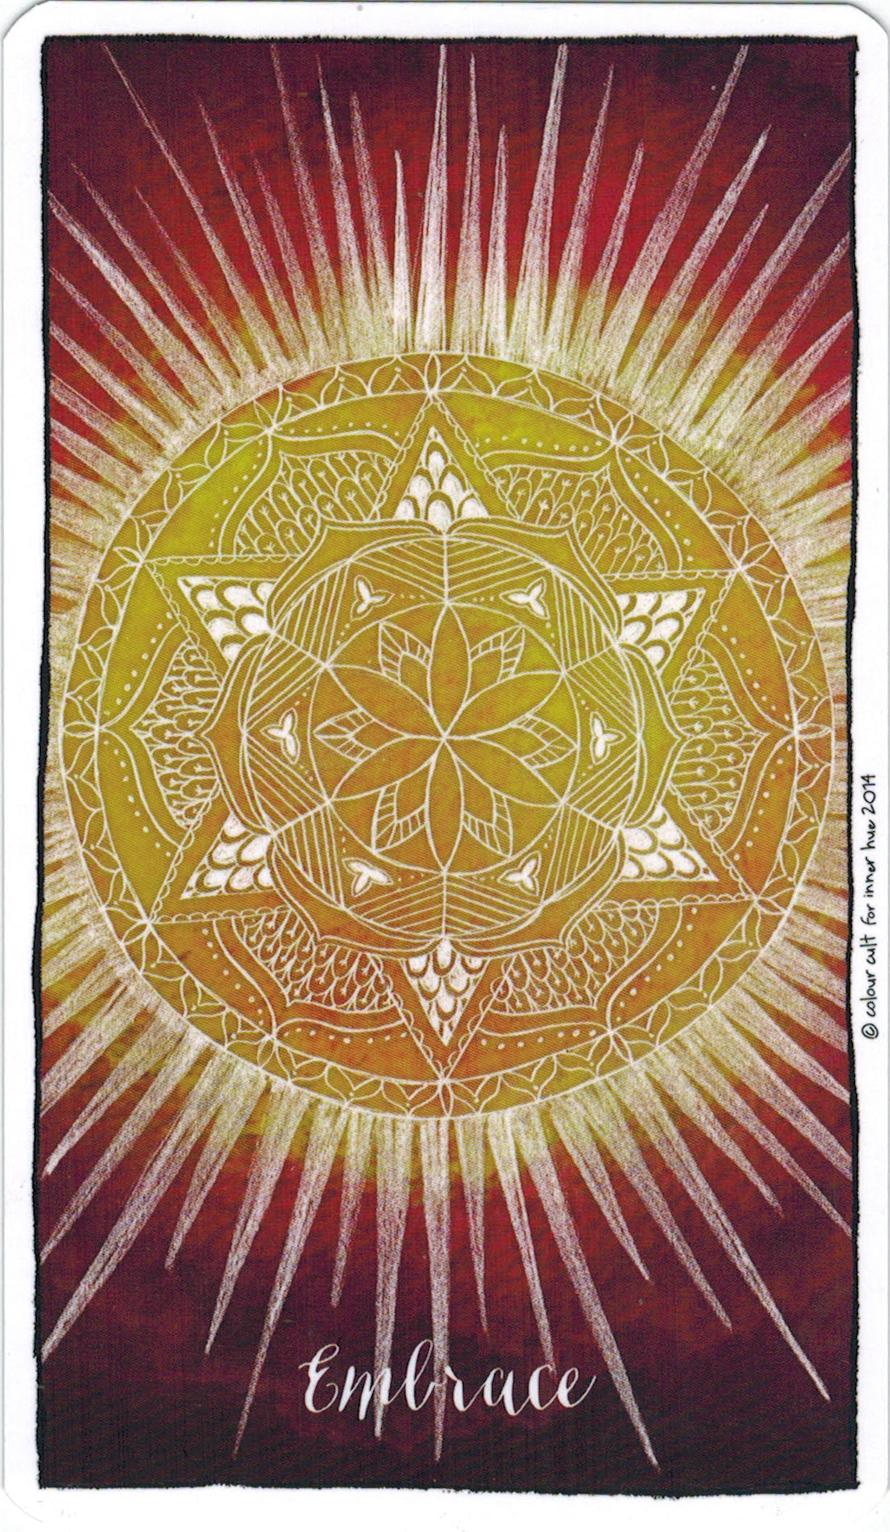 Ý nghĩa lá Embrace trong bộ bài Connected & Free - The Alchemist's Oracle